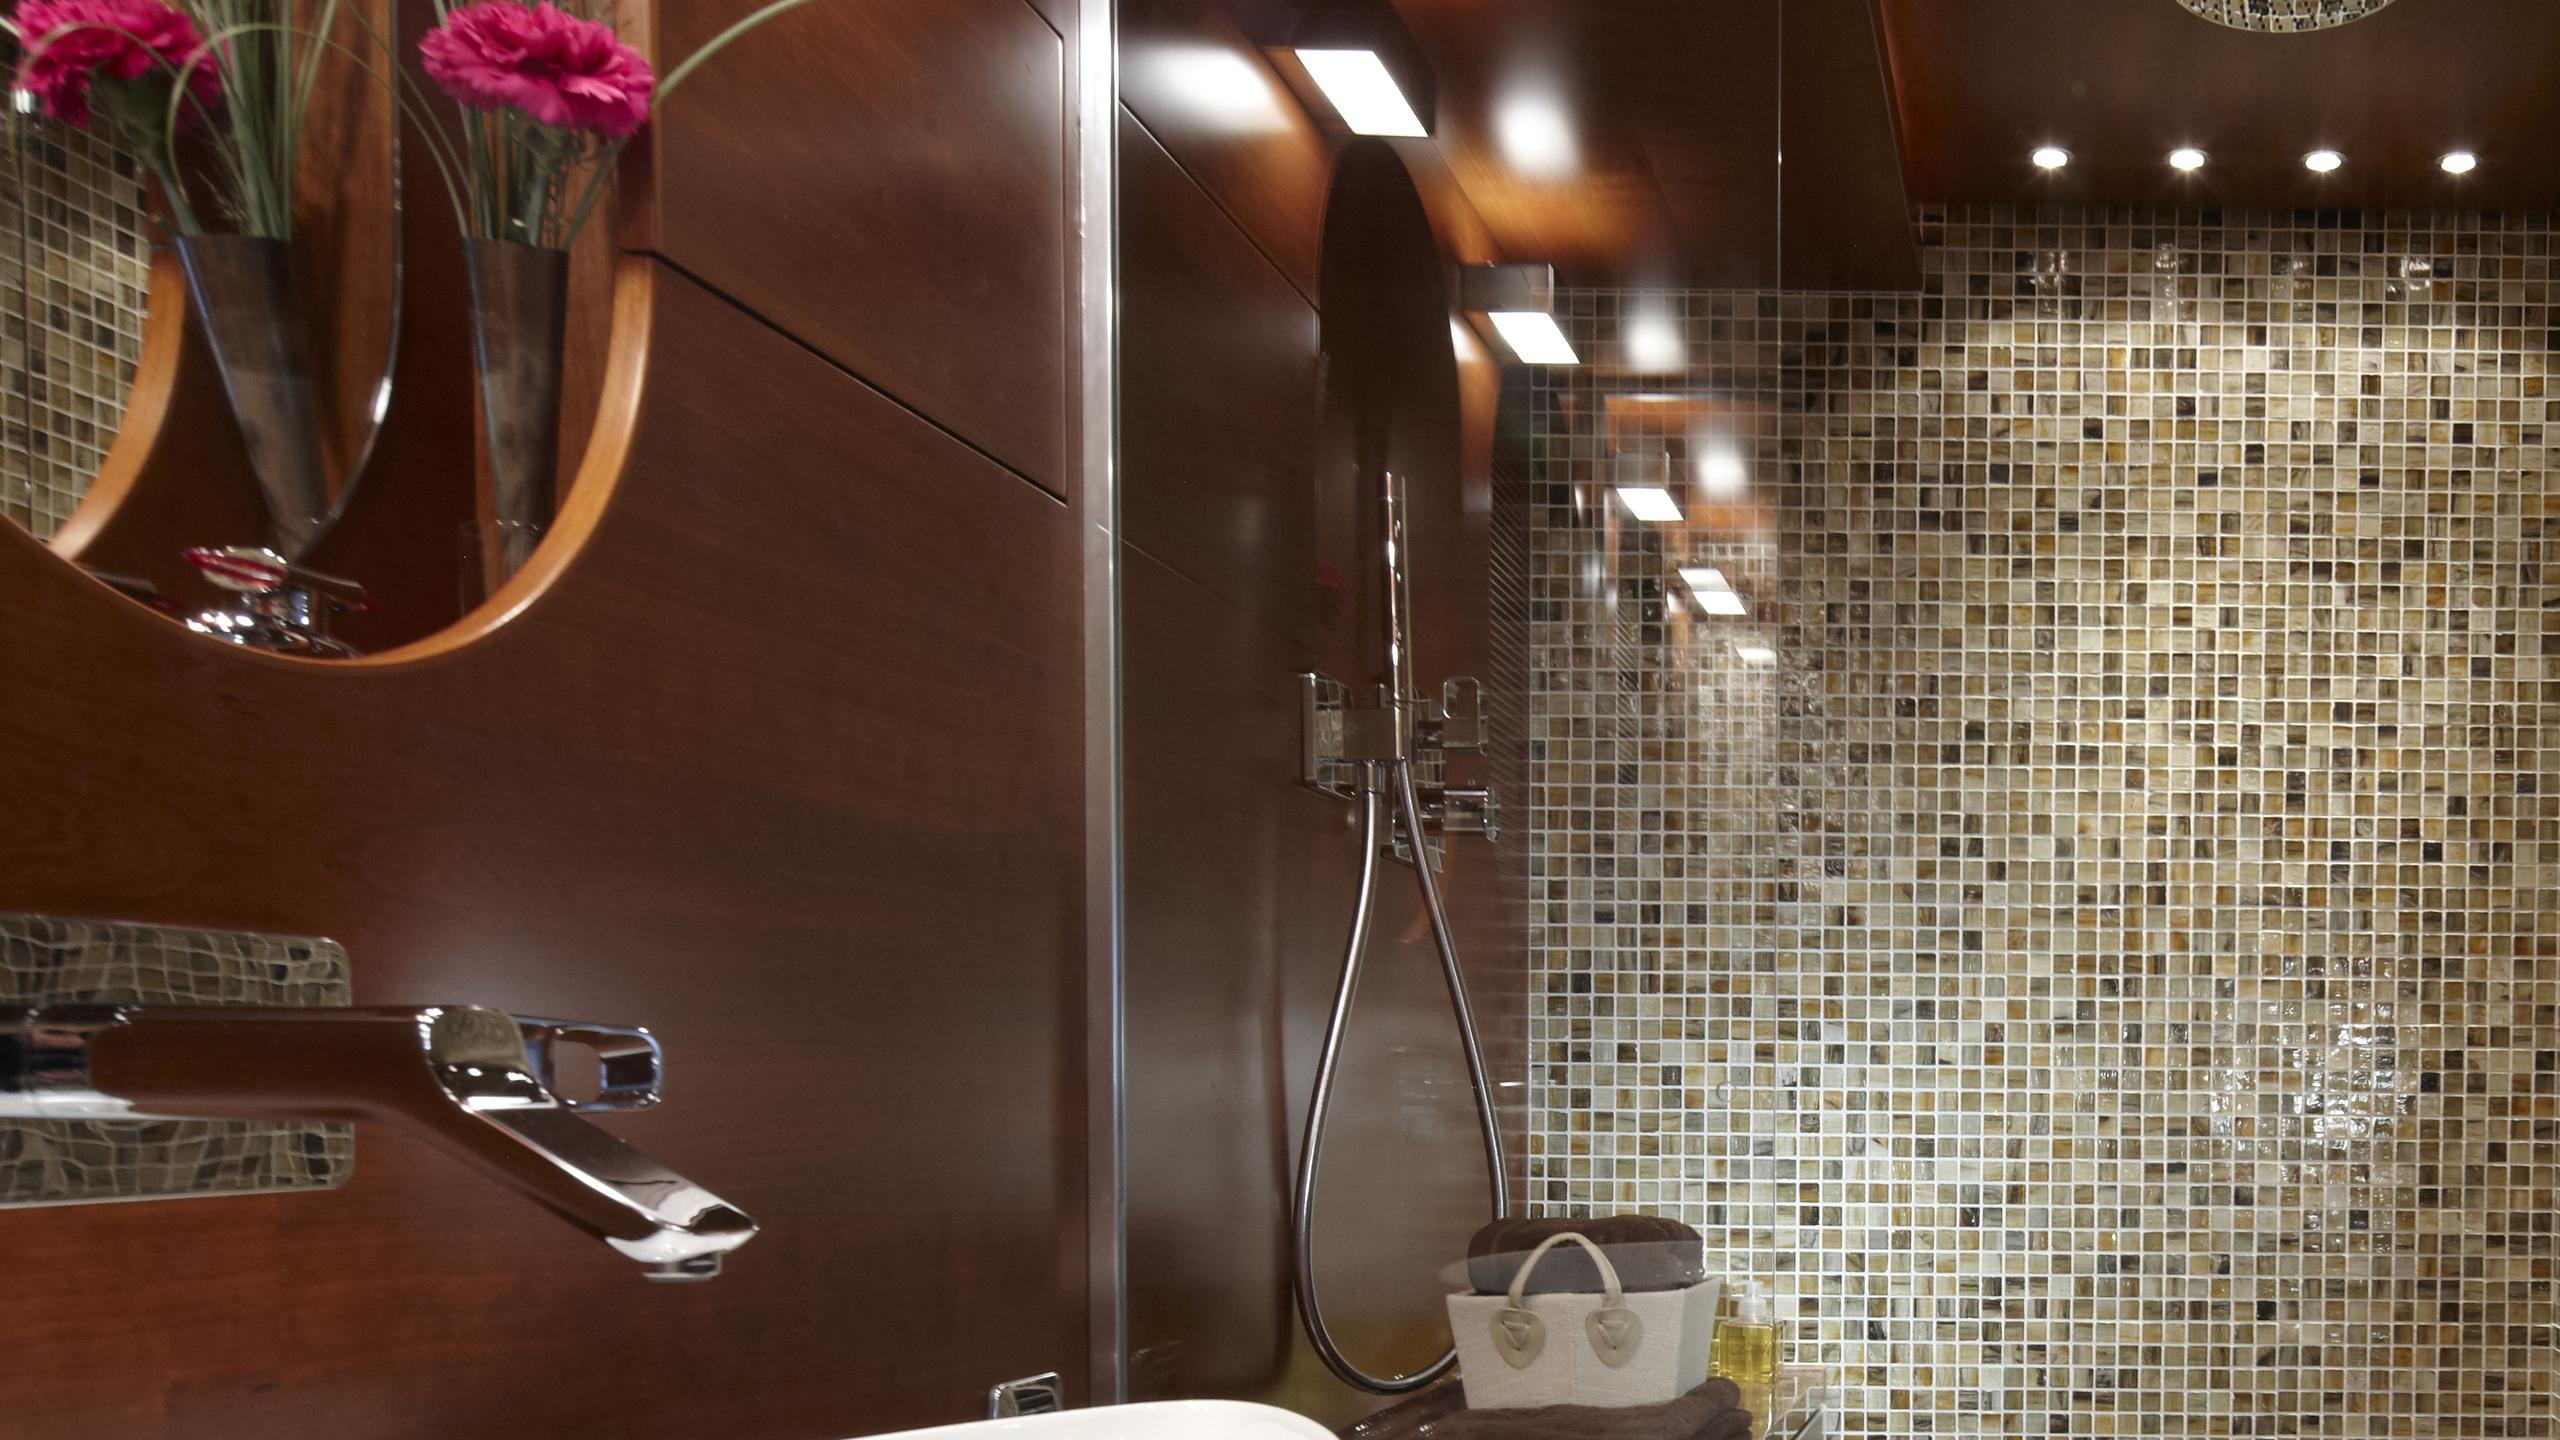 sofia-ii-yacht-bathroom